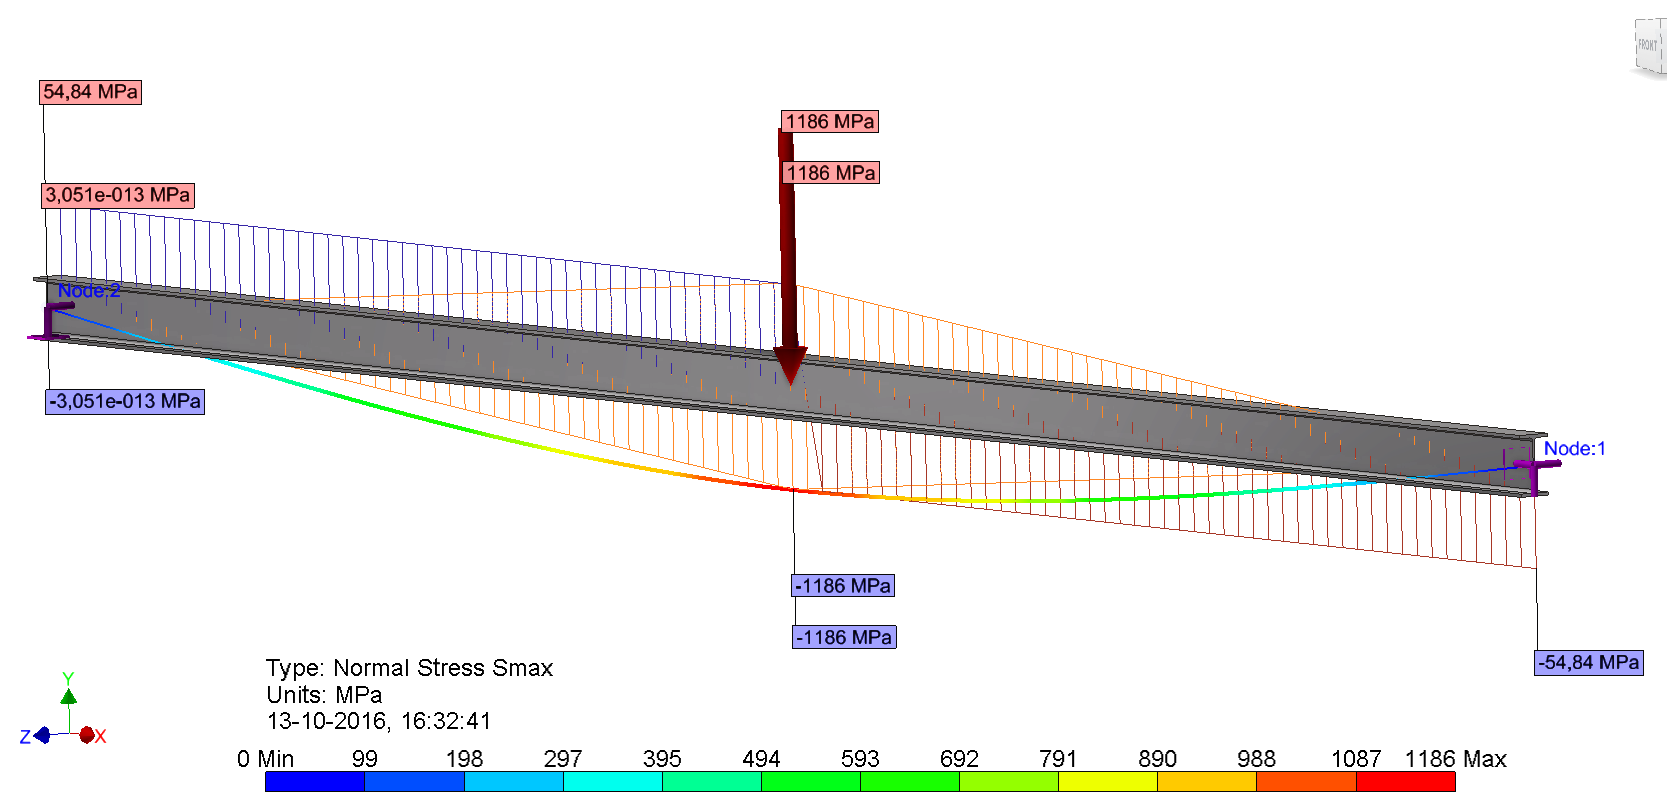 sterkteberekening-profielbalk-met-frame-analysis